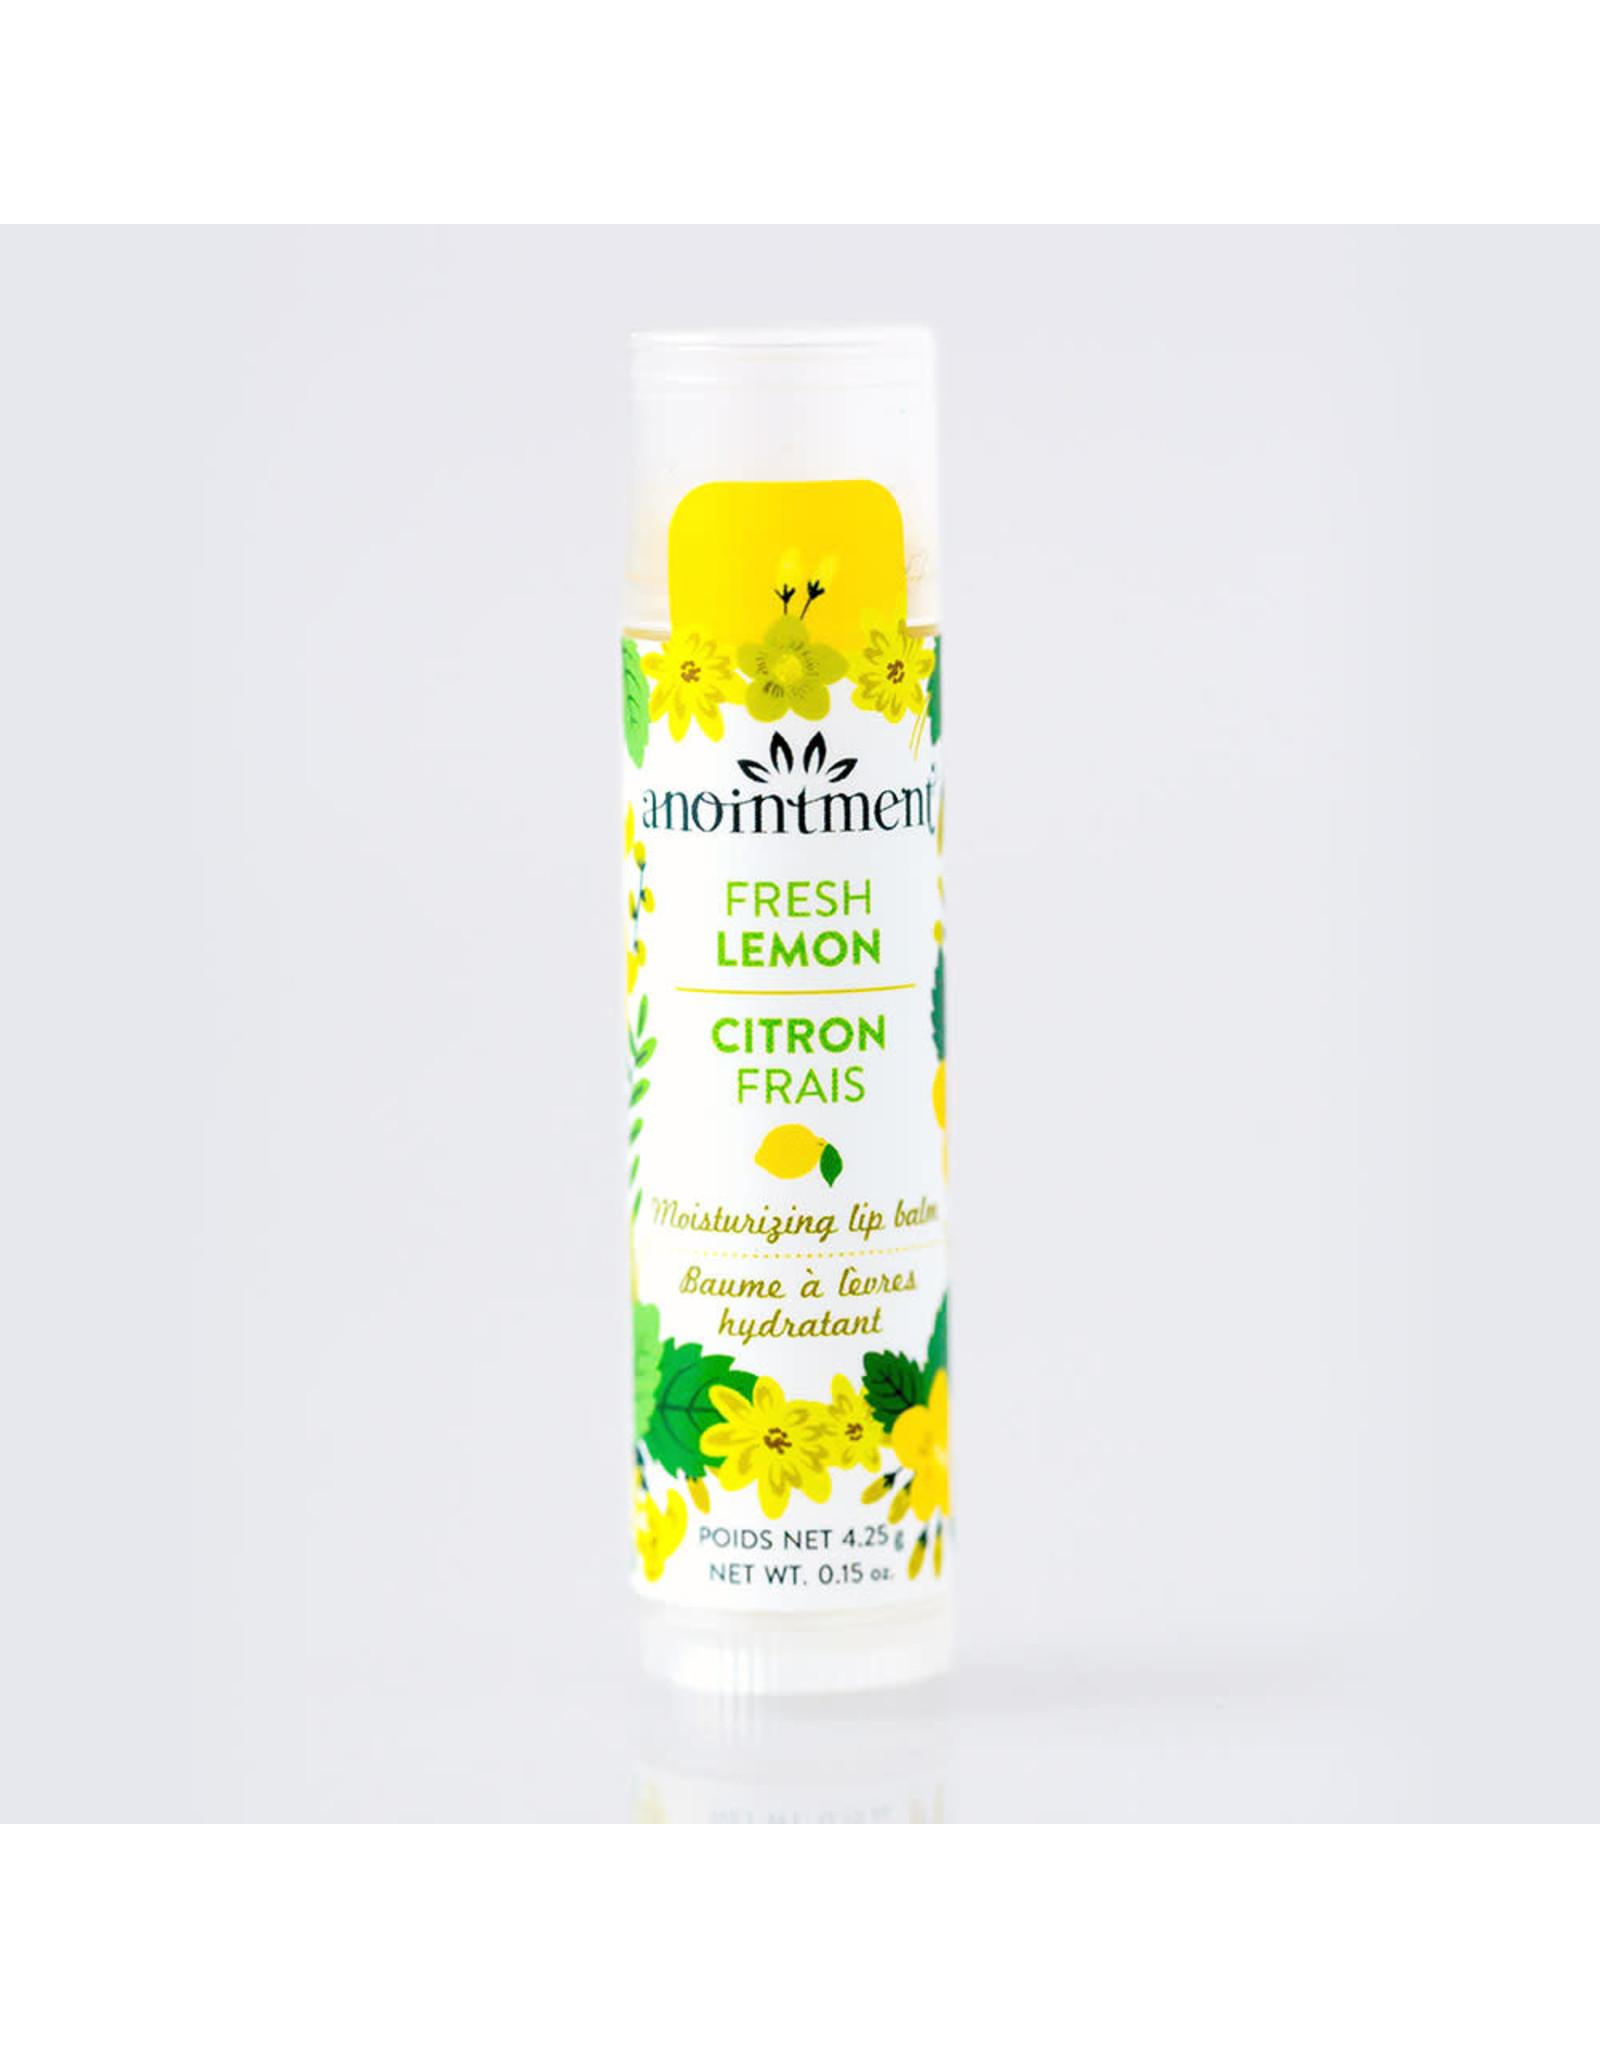 Anointment Lemon Lip Balm